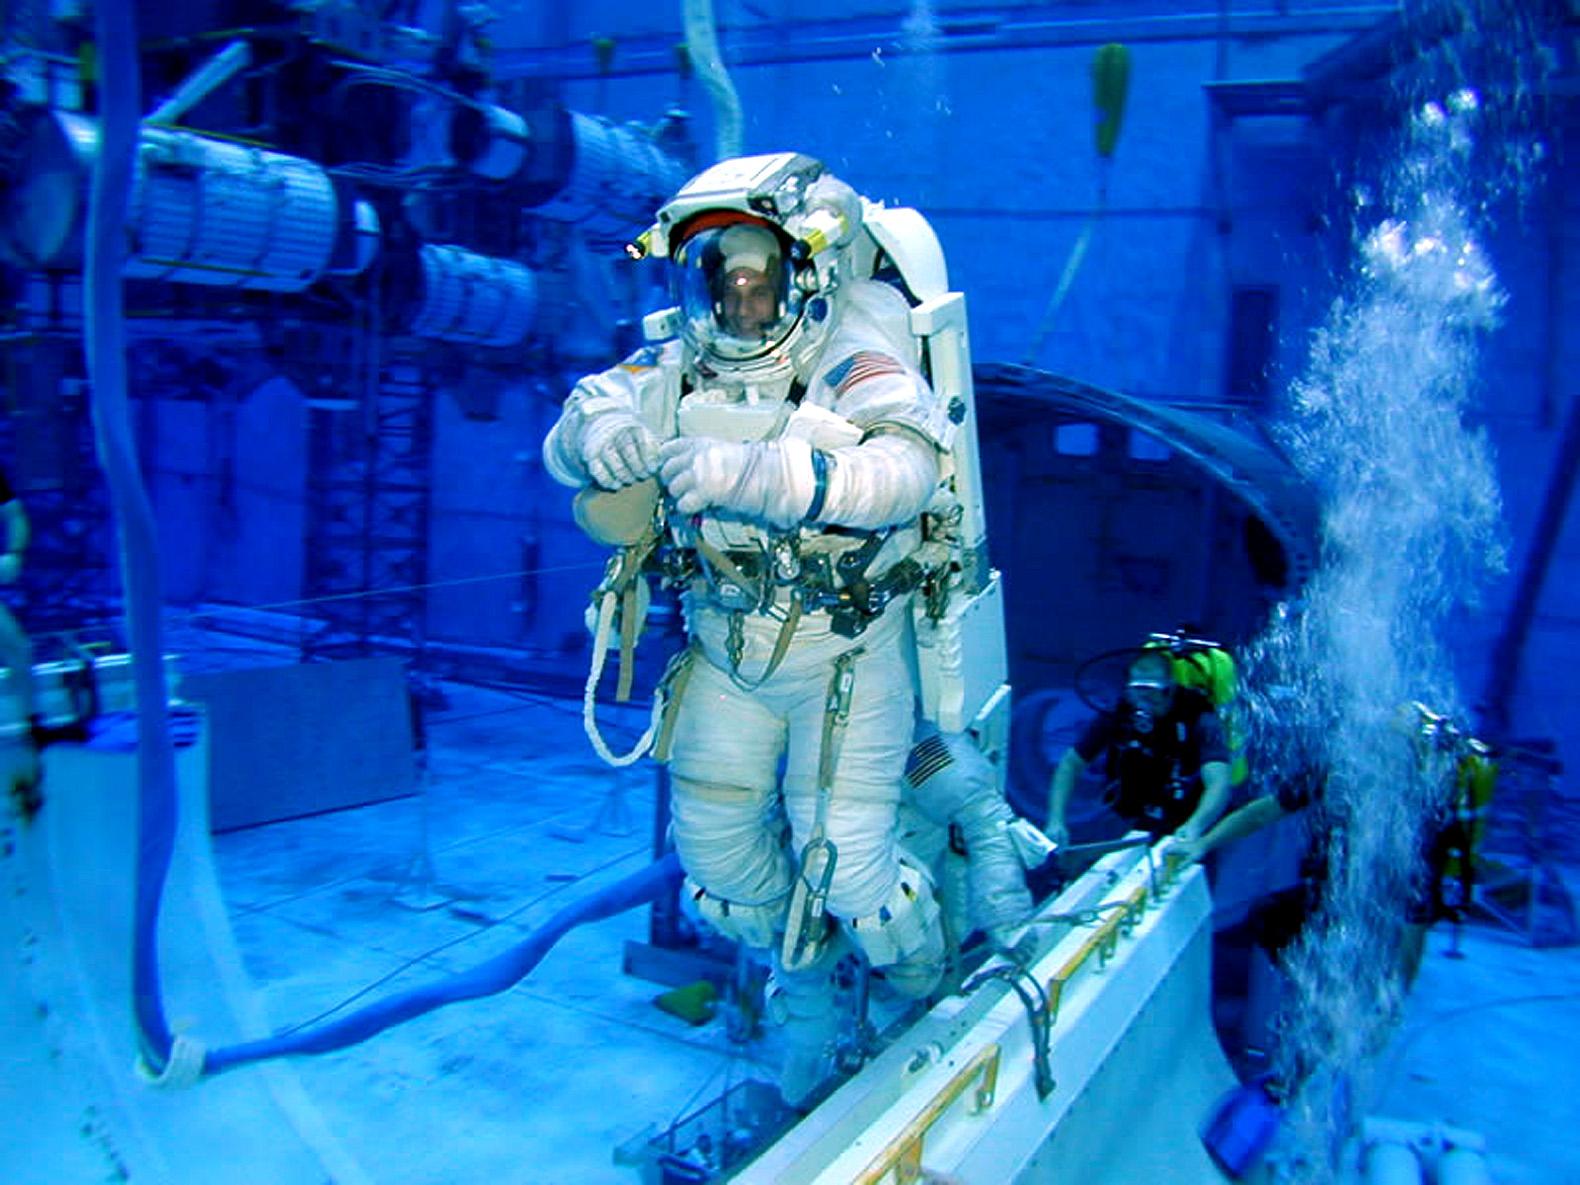 A Nasa astronaut training underwater